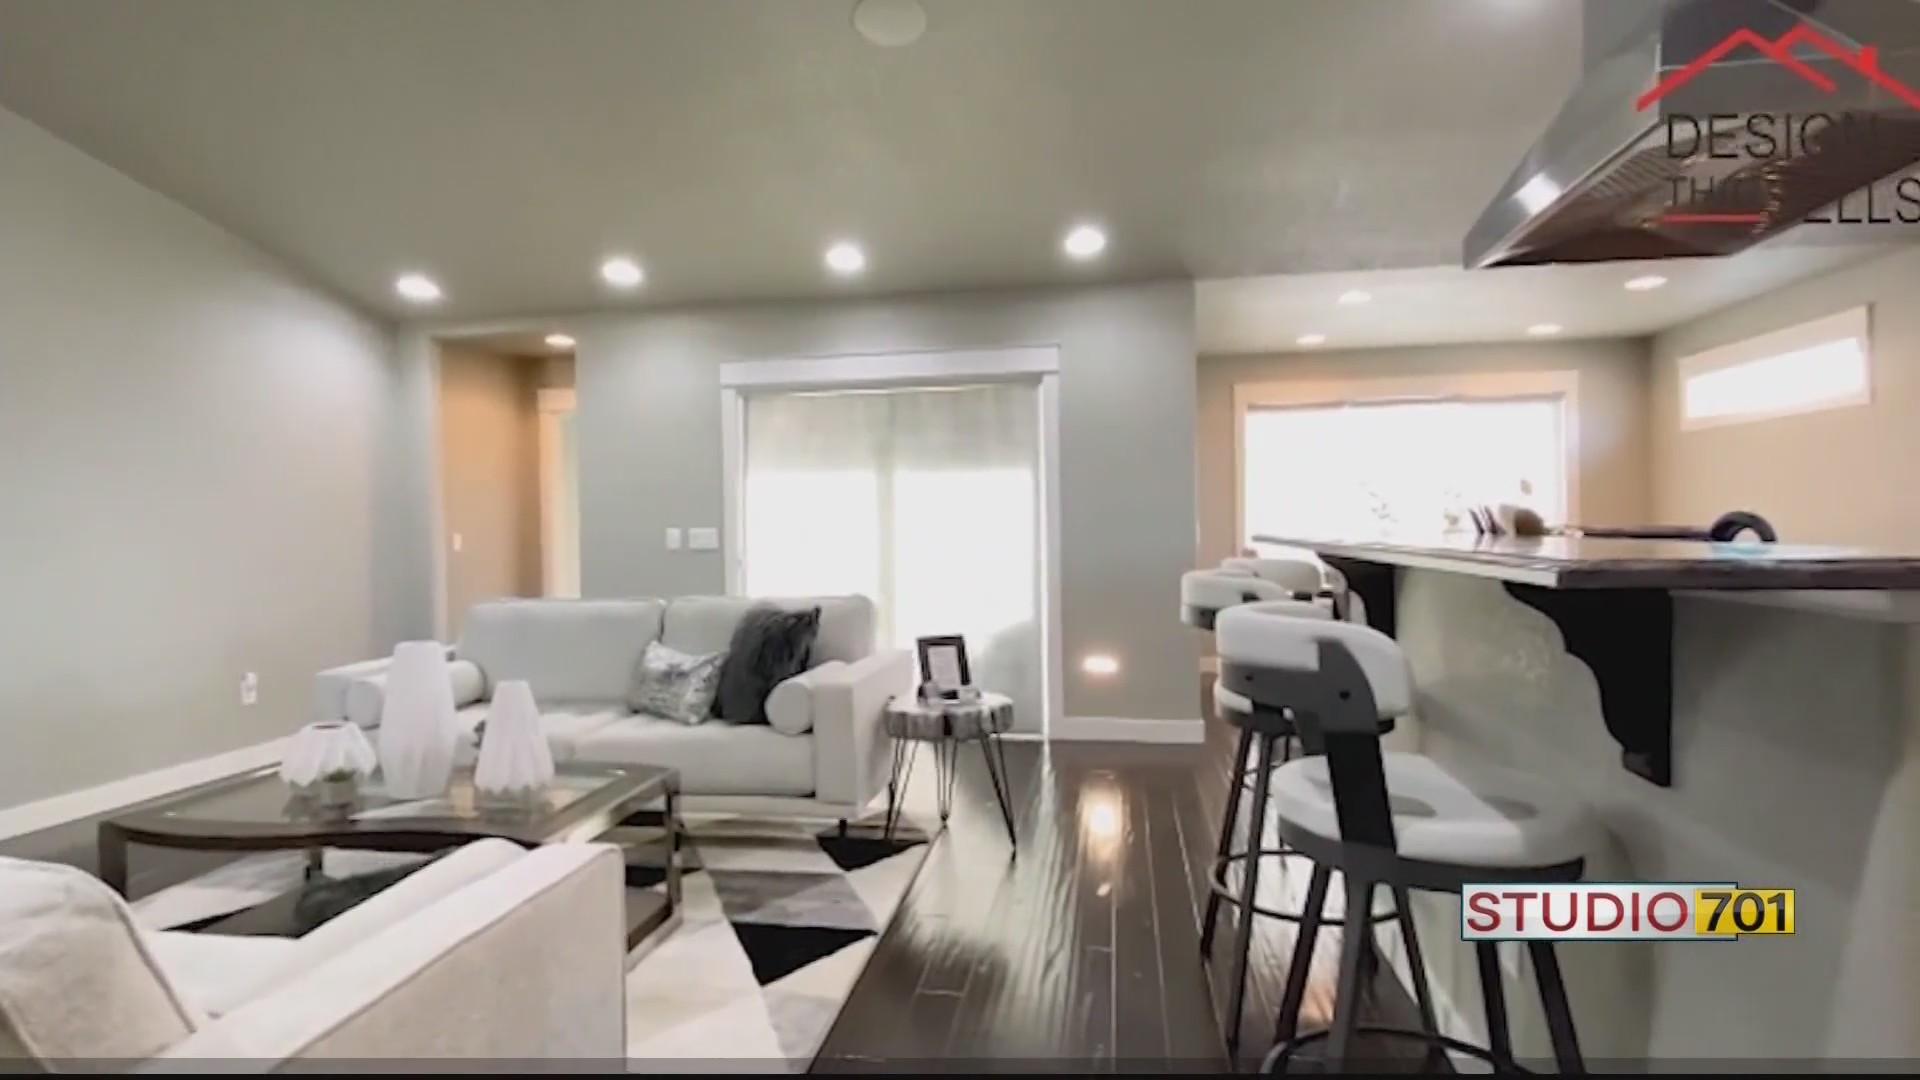 Home Improvement Sponsored By Arrow Service Team Kx News